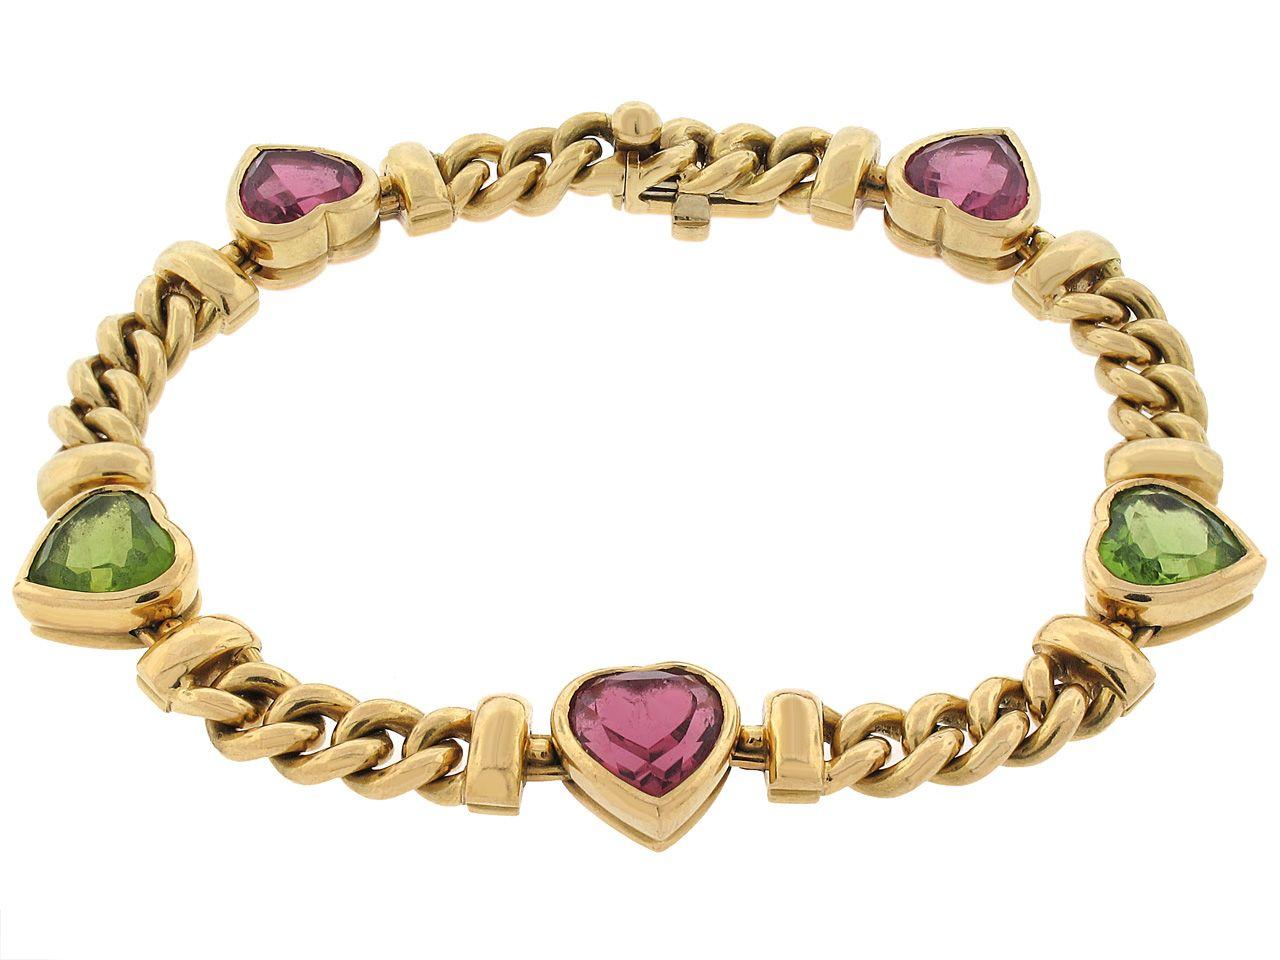 Beaded Bracelet Peridot High Grade 14K Solid Gold Natural Bracelet Healing Stone Bracelet Rose Gold White Gold Real Peridot Yellow Gold